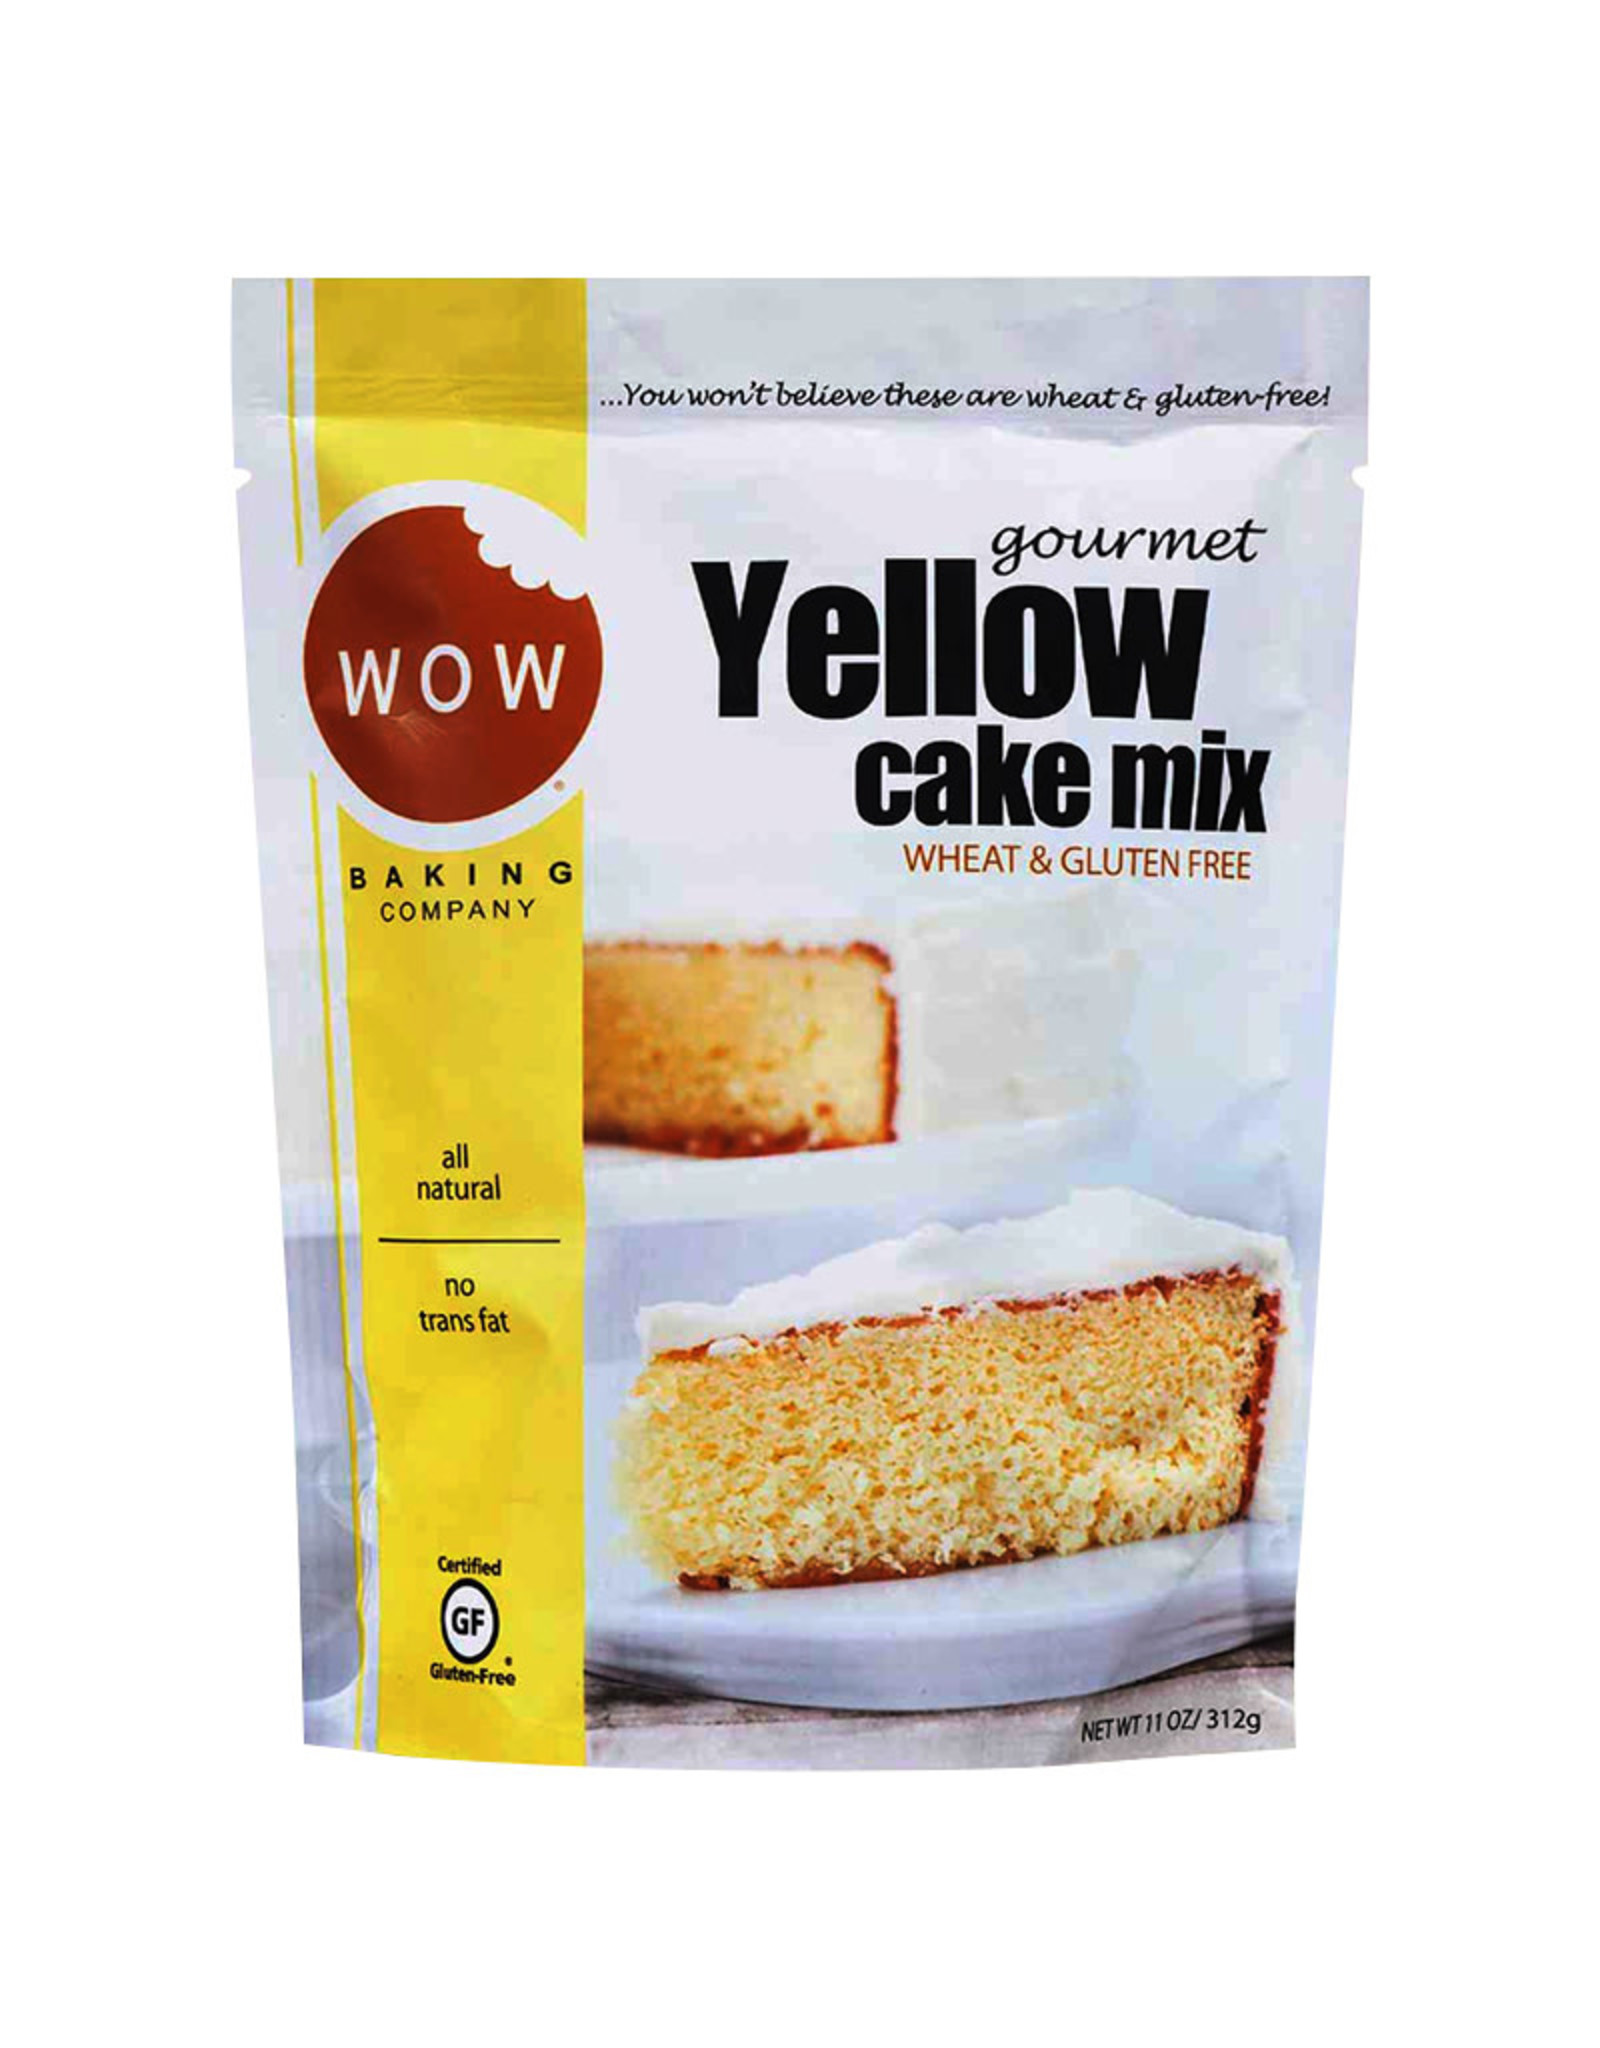 Wow Cake Wow Cake Mix - Yellow (312g)